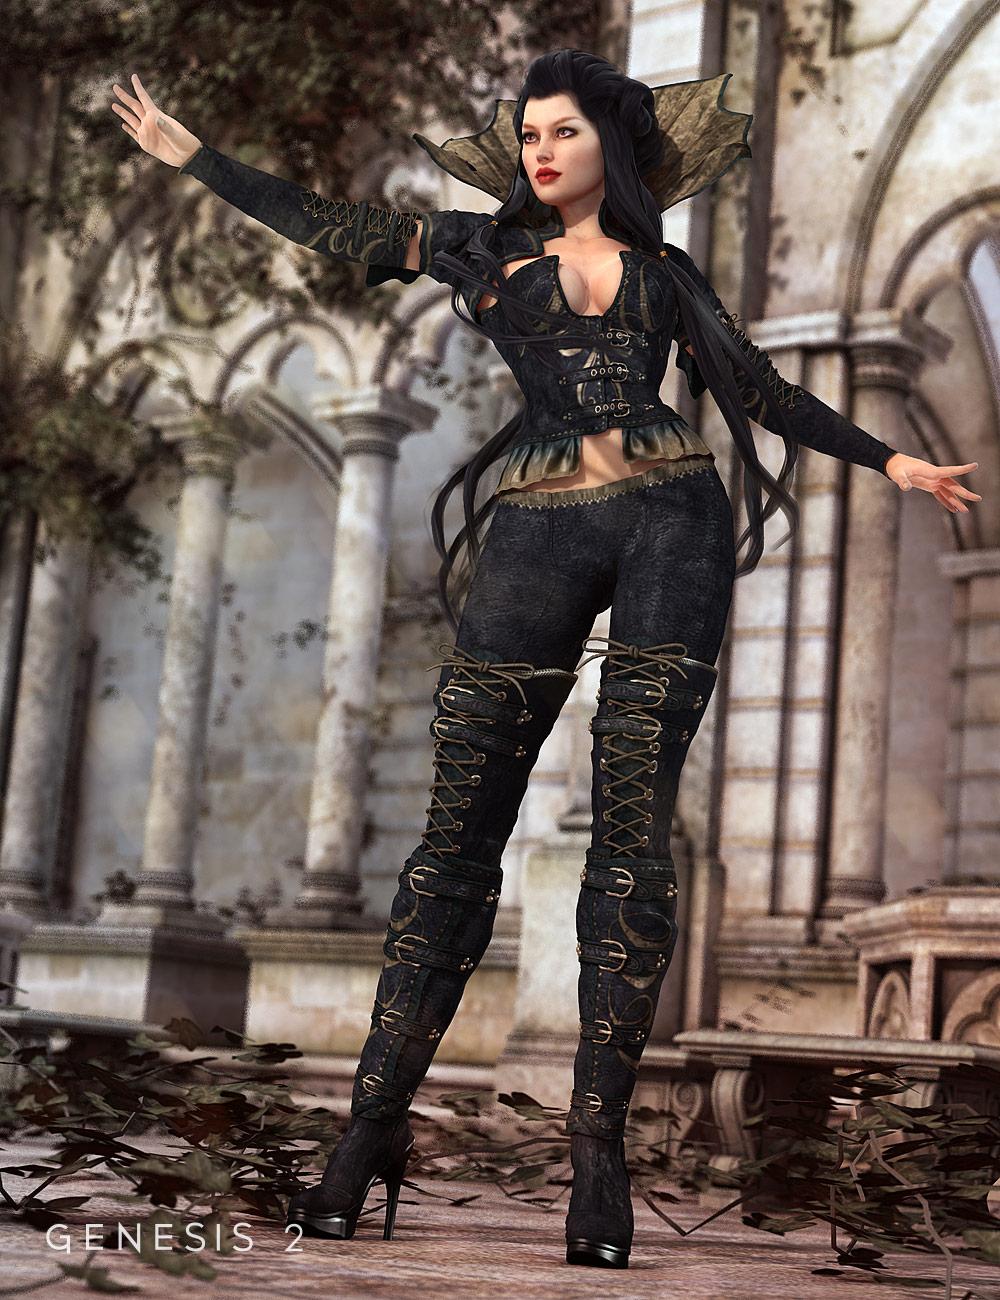 Dark Princess for Genesis 2 Female(s) by: Barbara BrundonSarsa, 3D Models by Daz 3D